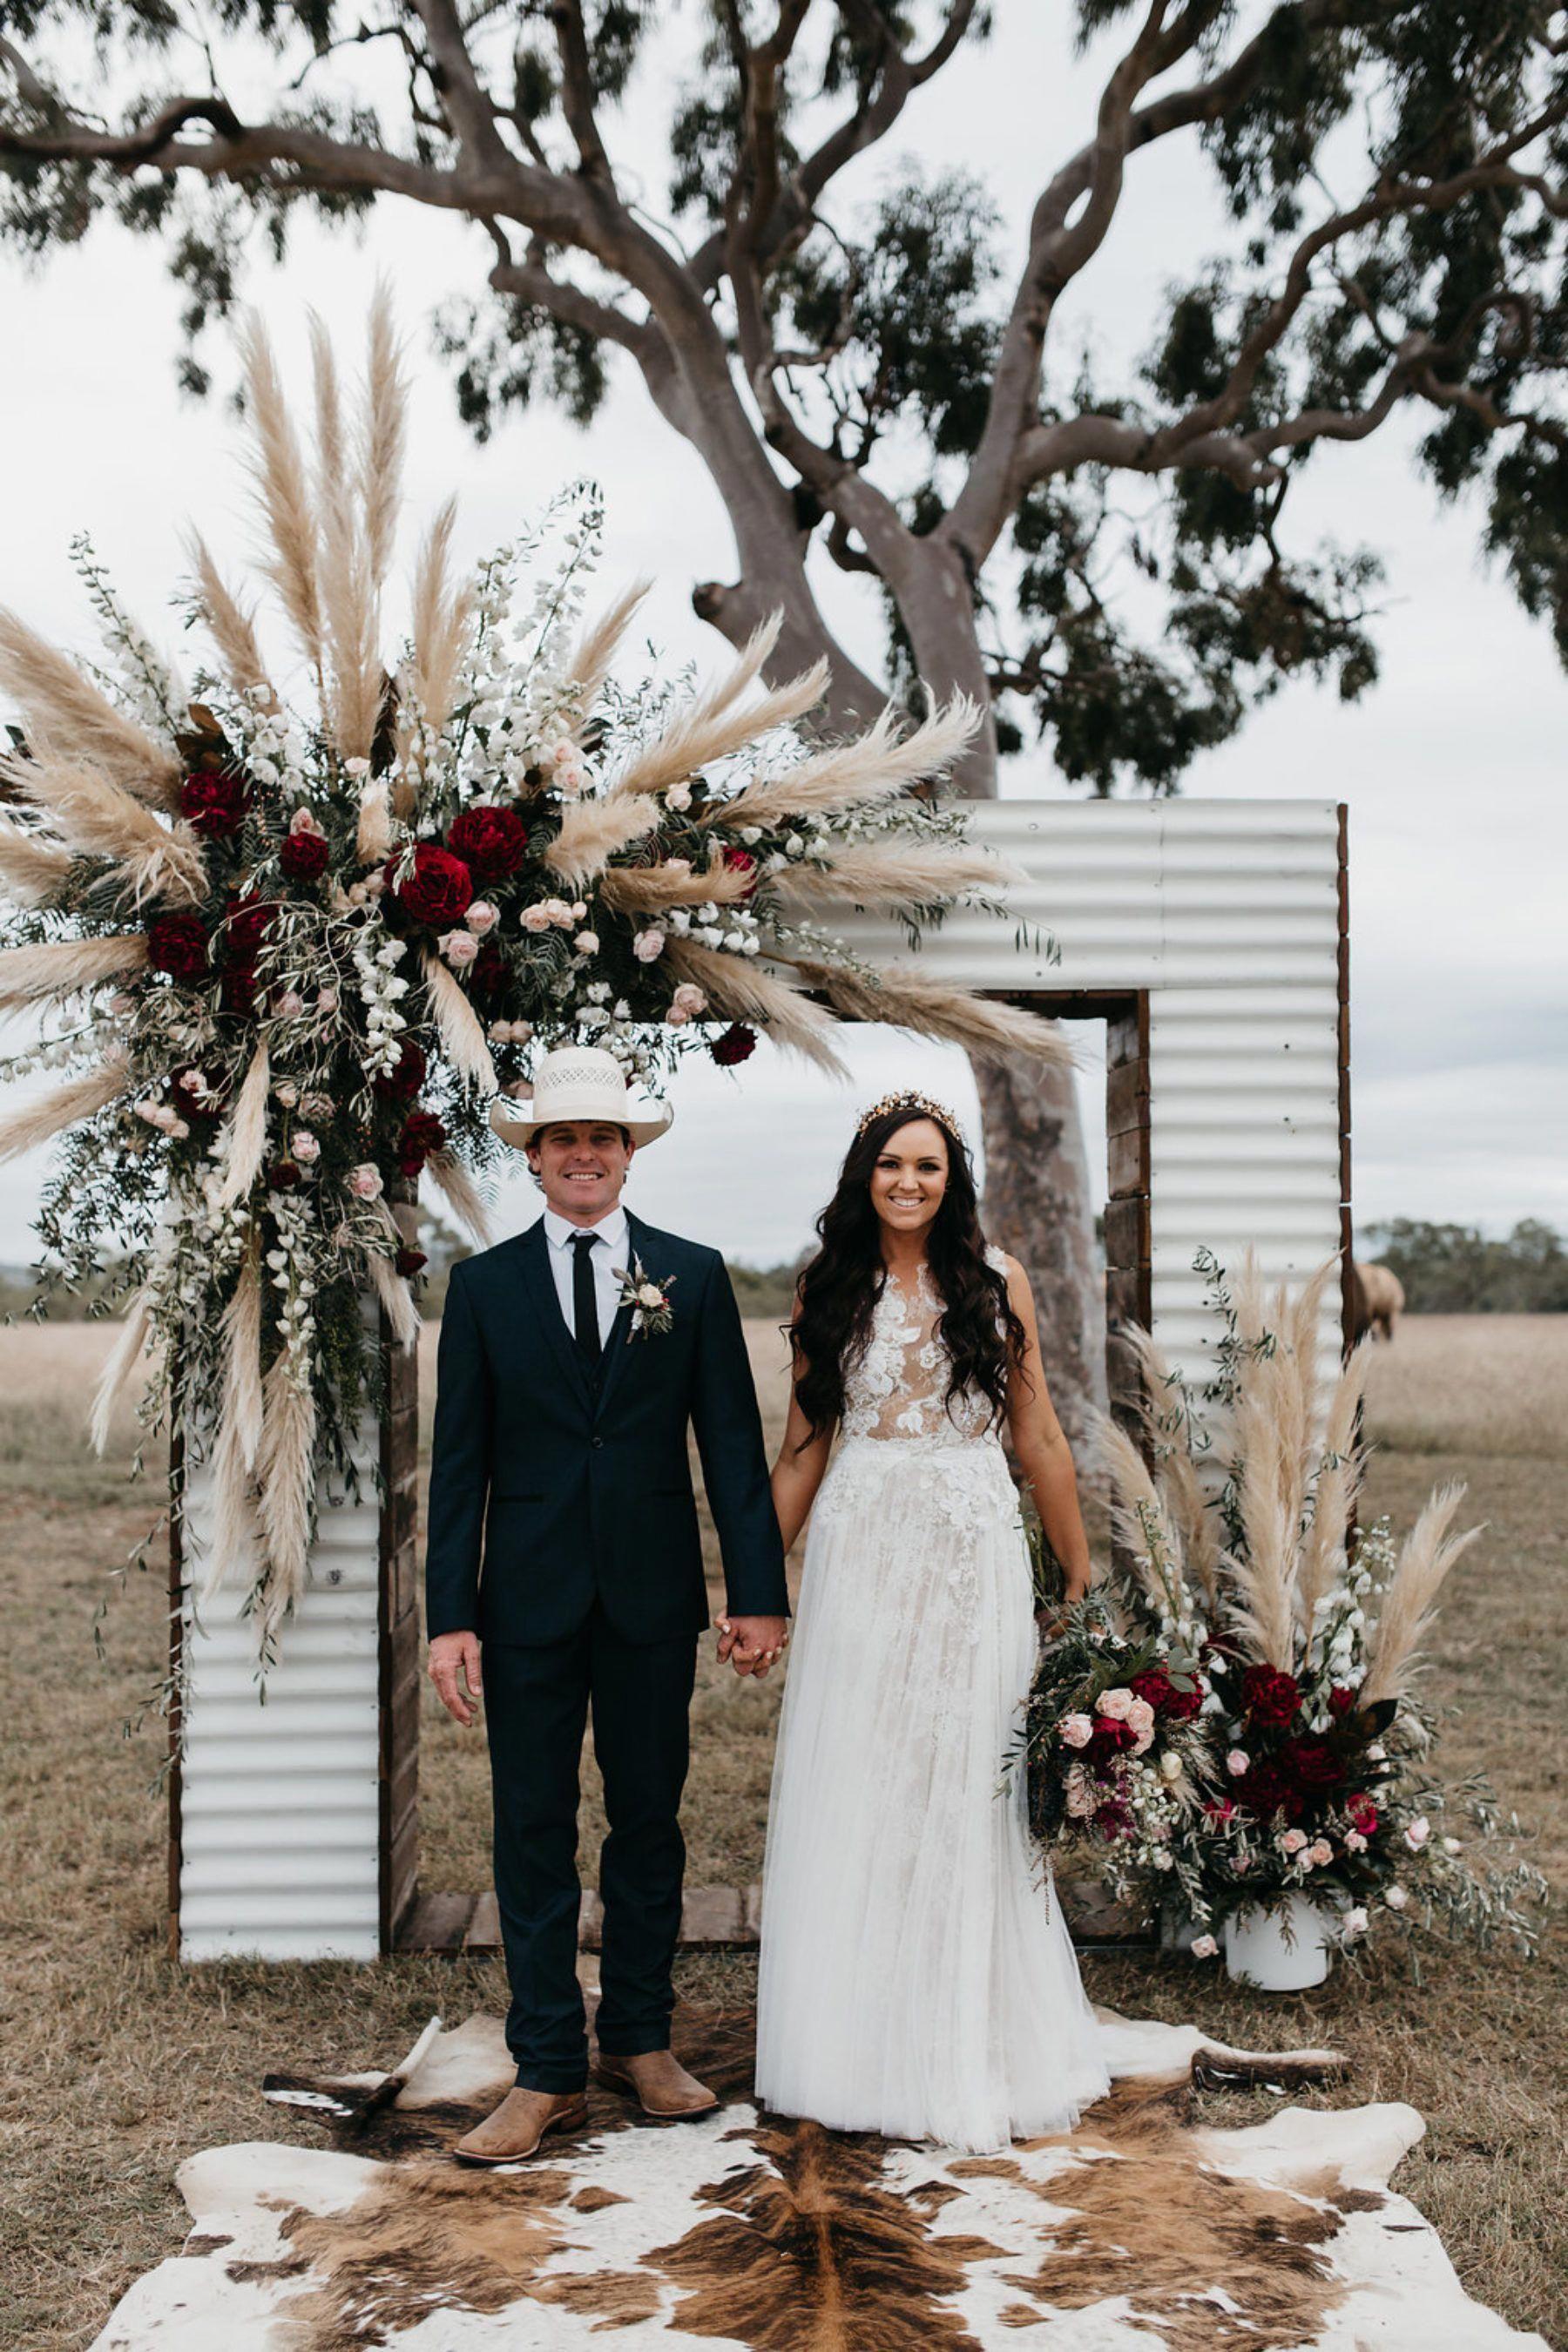 This Is Really Great Romanticweddings Wedding Arch Wedding Decorations Western Wedding